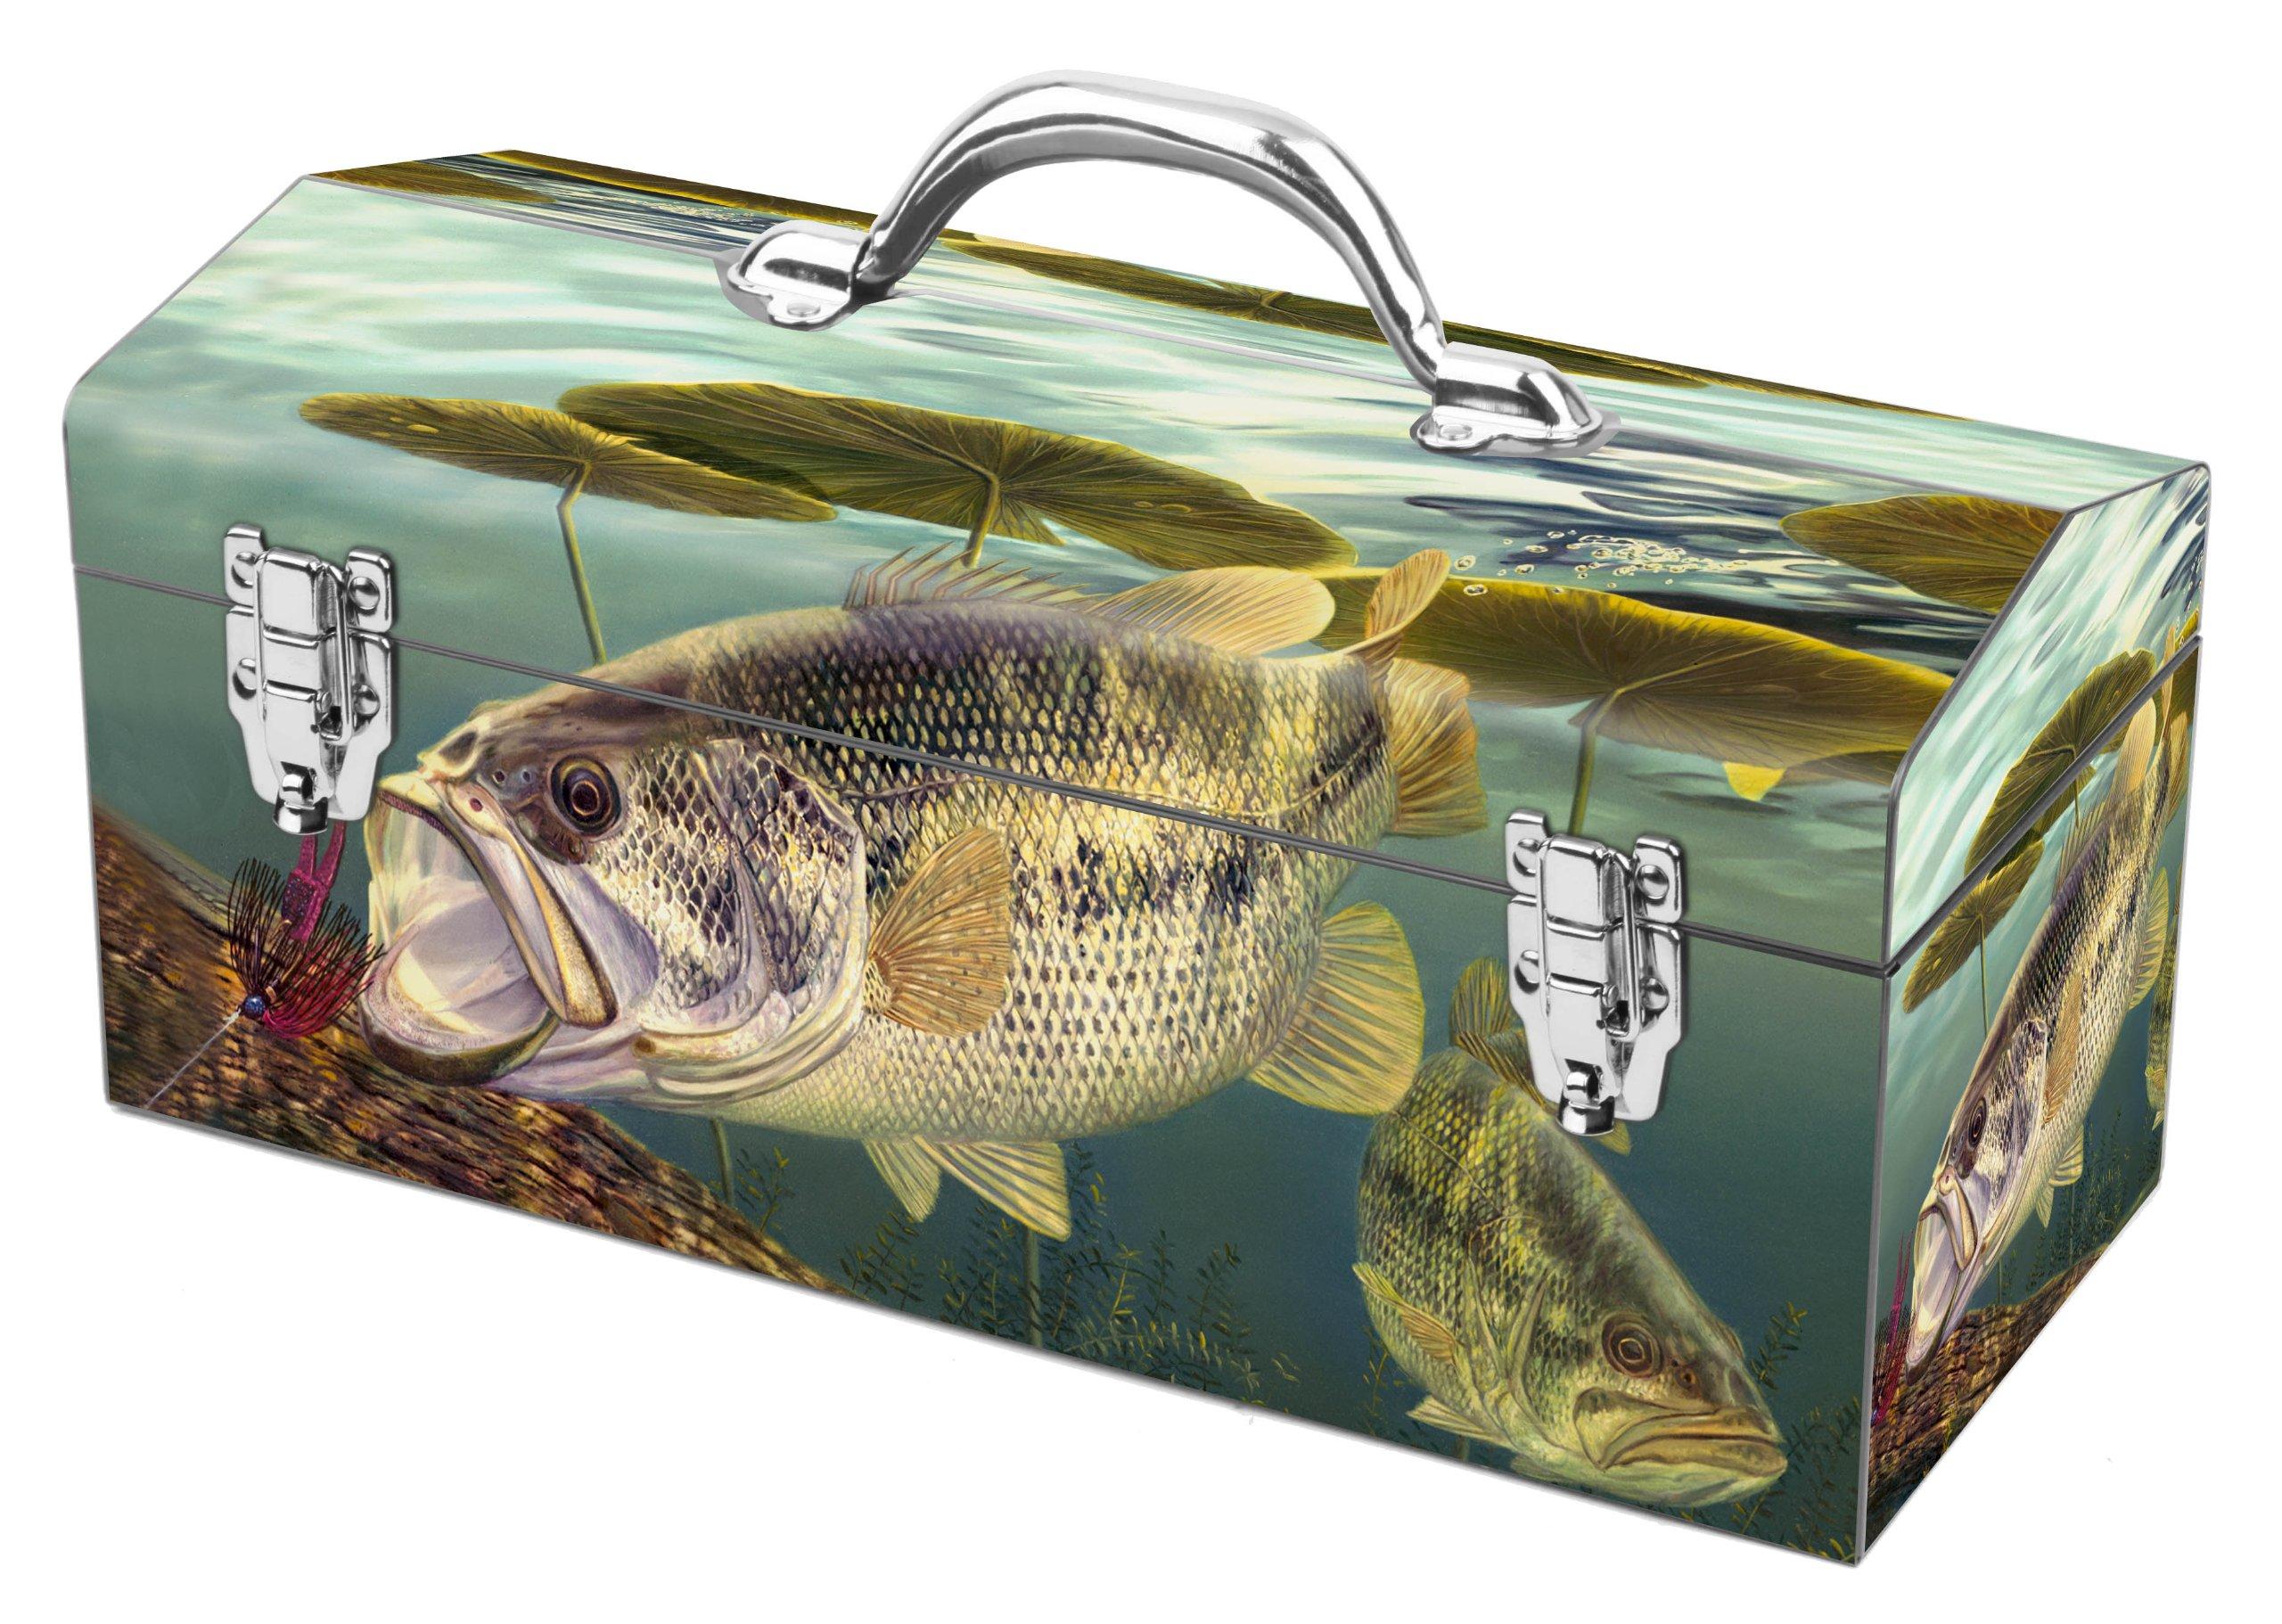 Sainty Art Works 24-701 A Pig, a Hog and a Log Art Deco Fishing Inspired Tool Box by Sainty Art Works